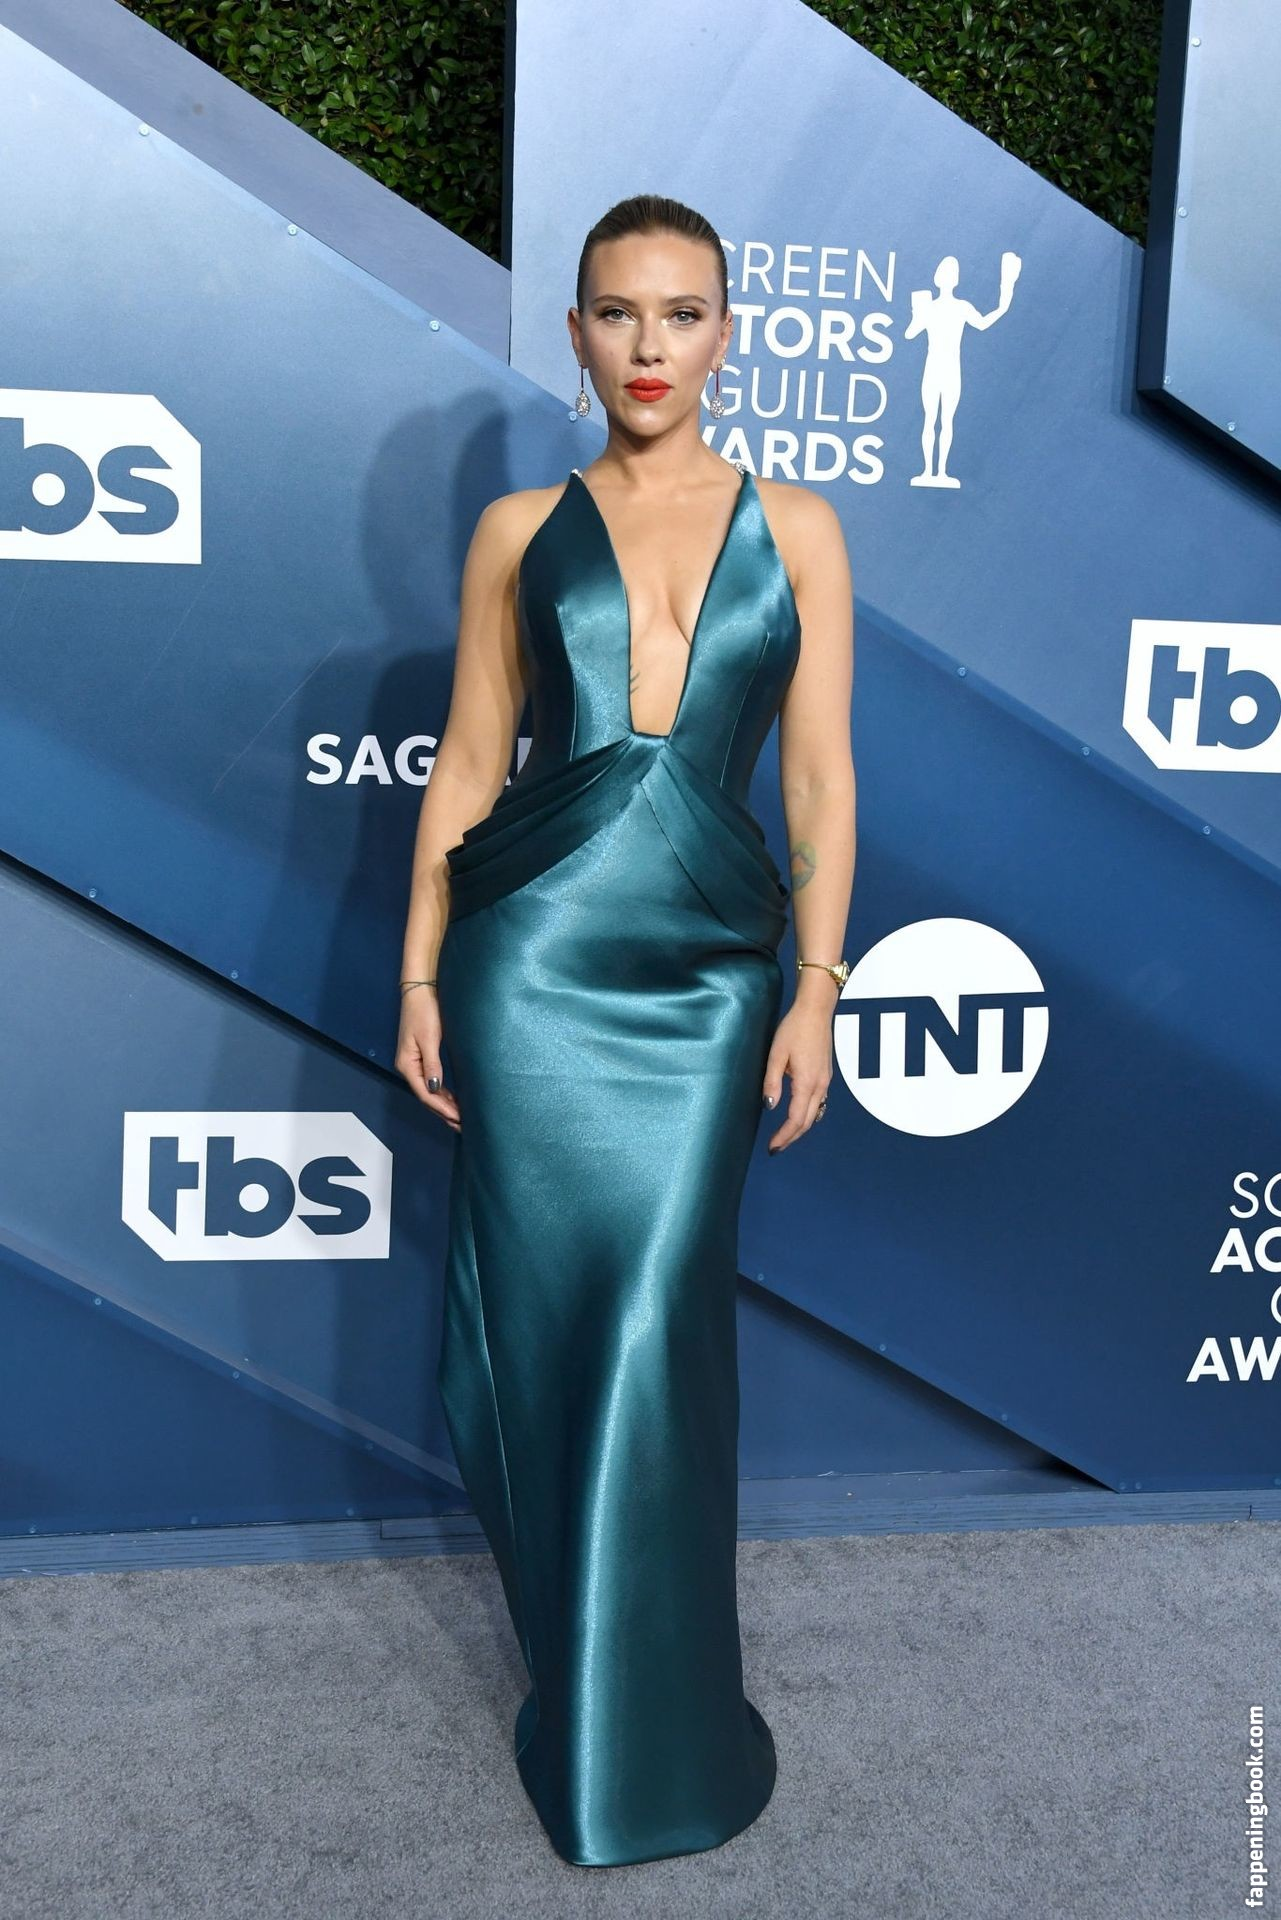 Scarlett Johansson Latest Hot Images,Wallpapers,Photos